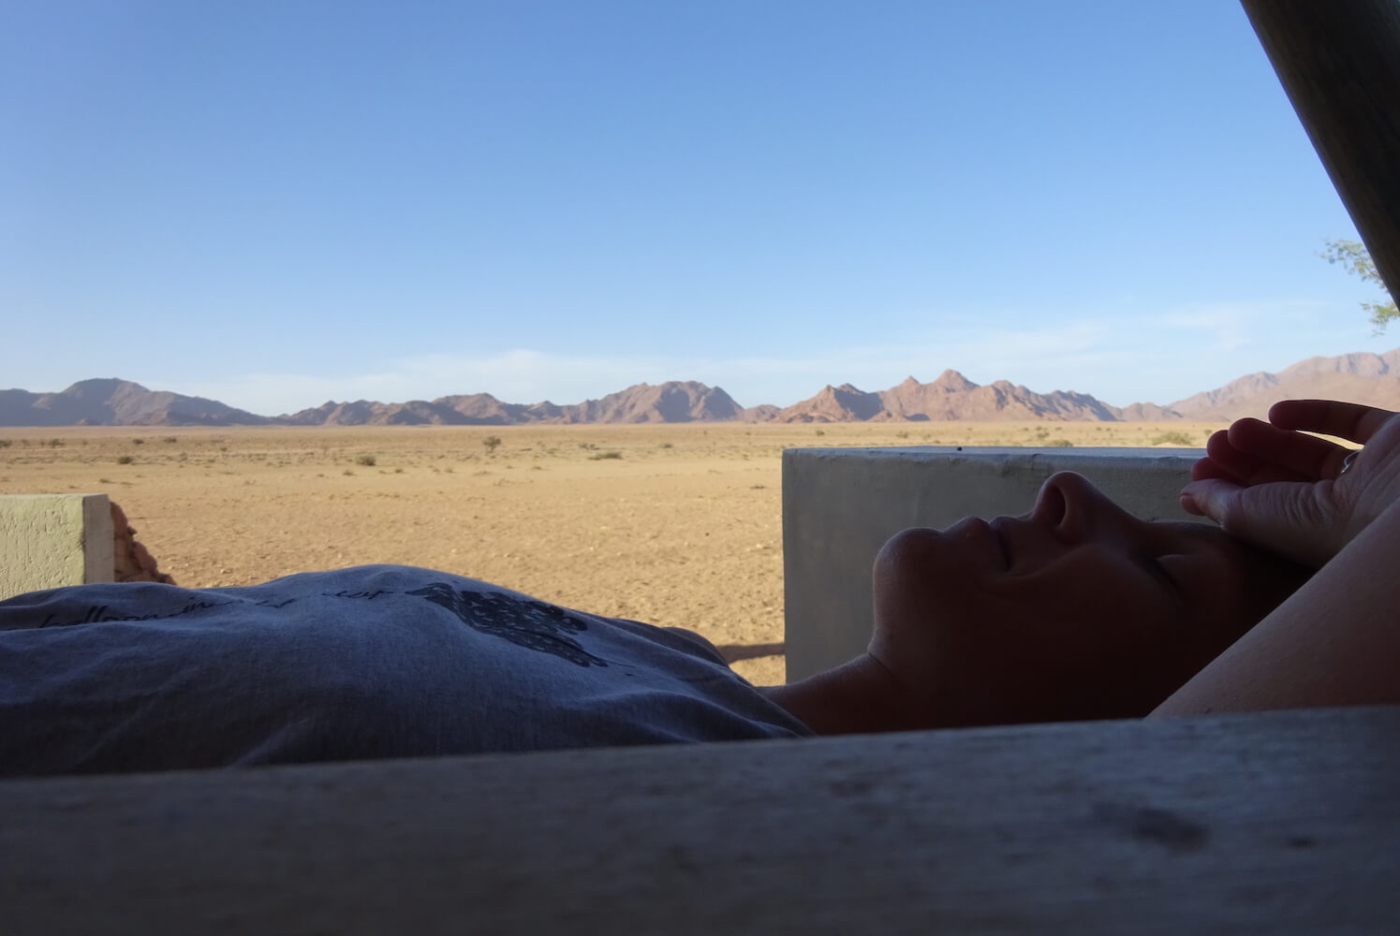 Seele im Urlaub in Namibia